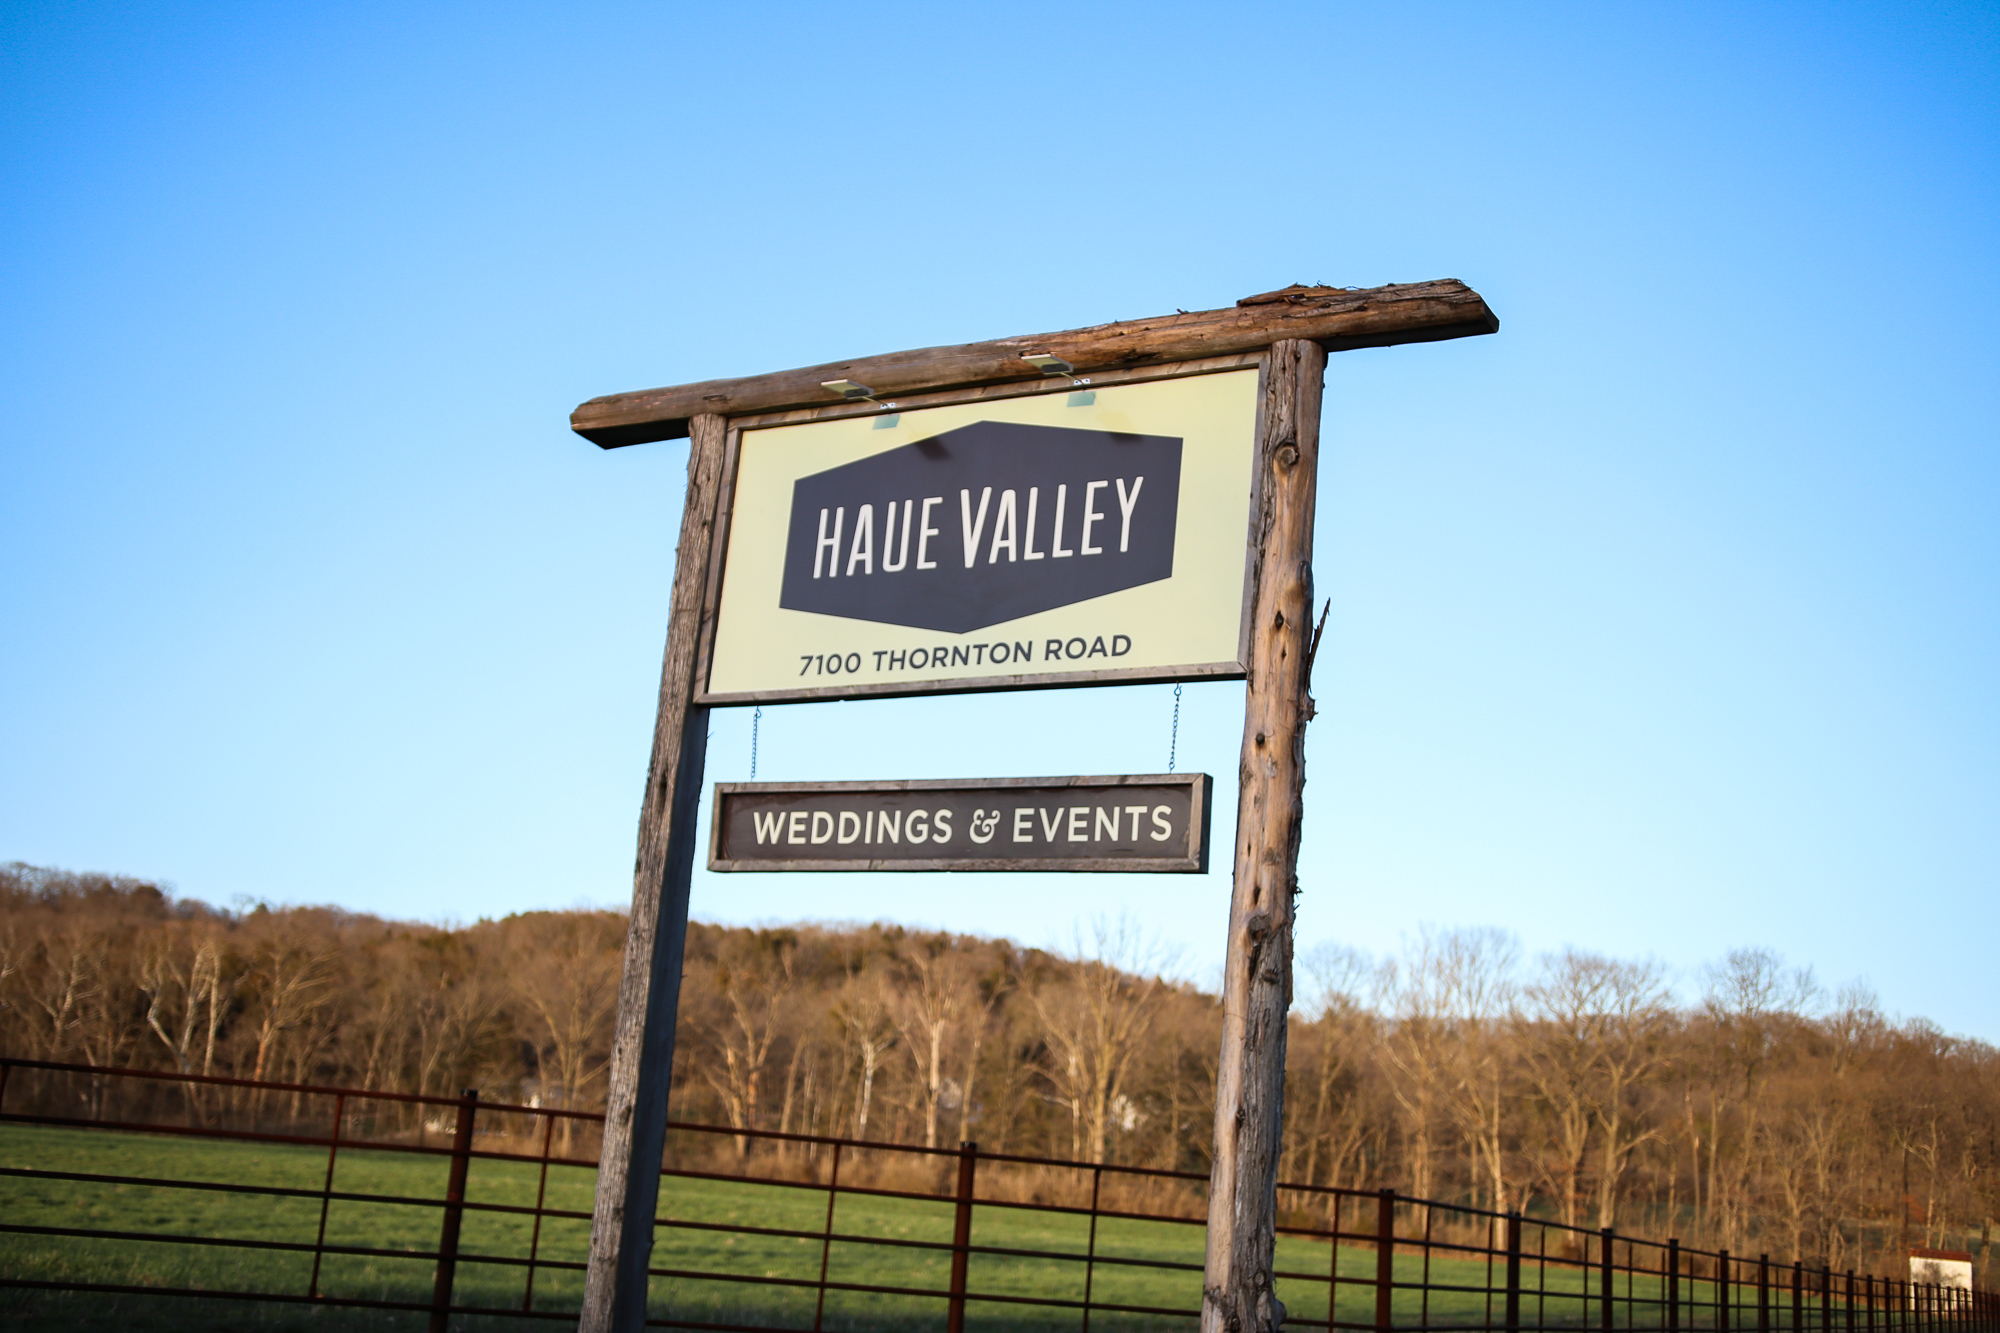 St. Louis Wedding Venues - Haue Valley